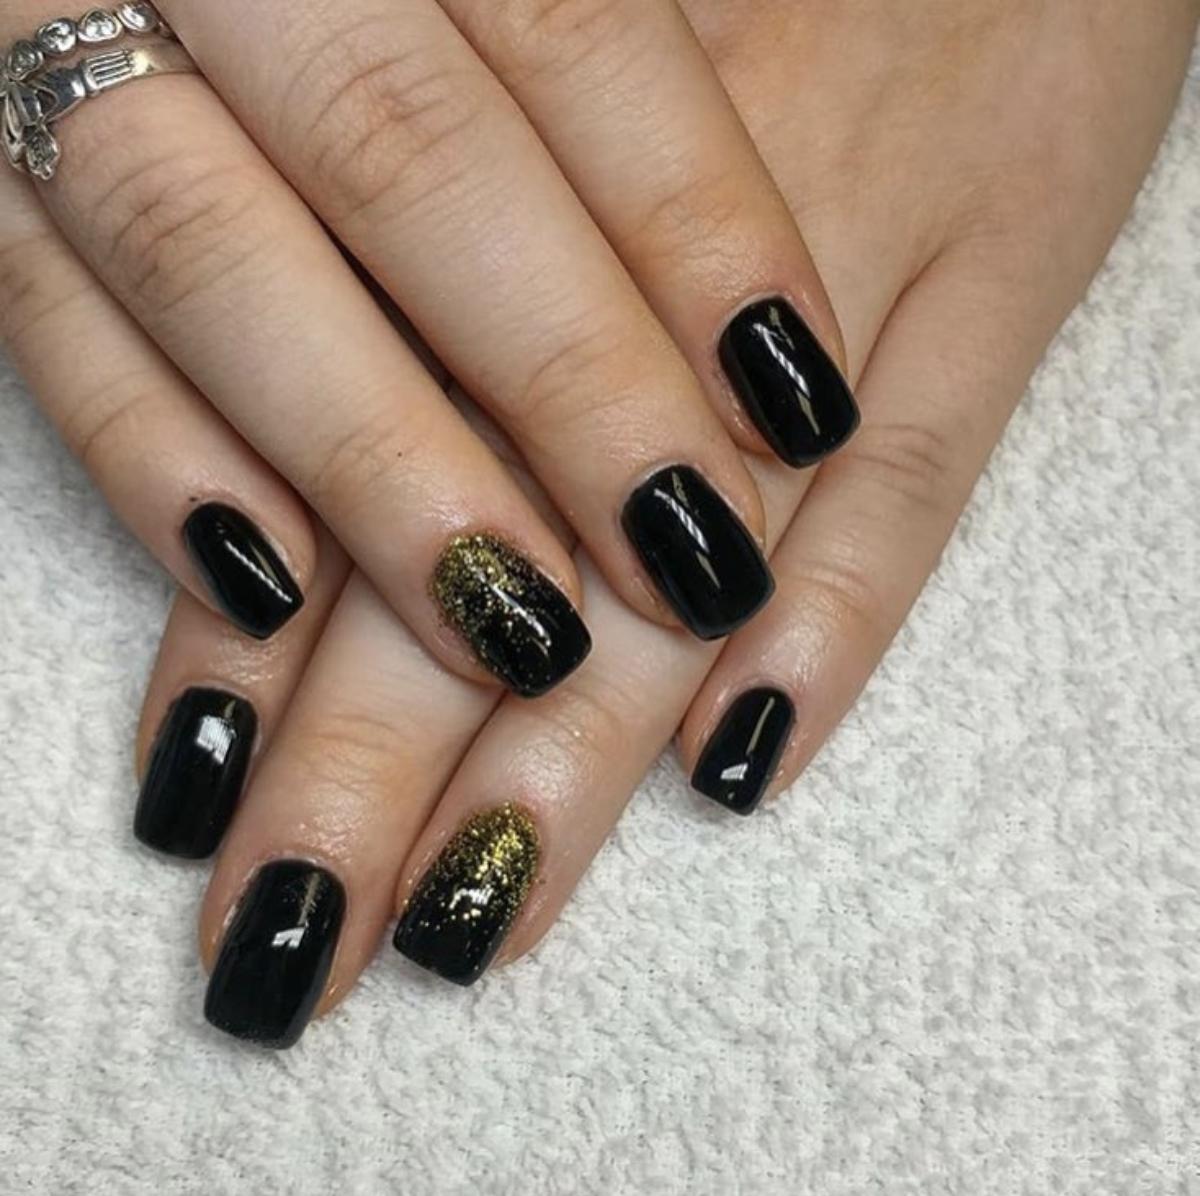 Nail Technician Beauty institute, Nail technician, Nails